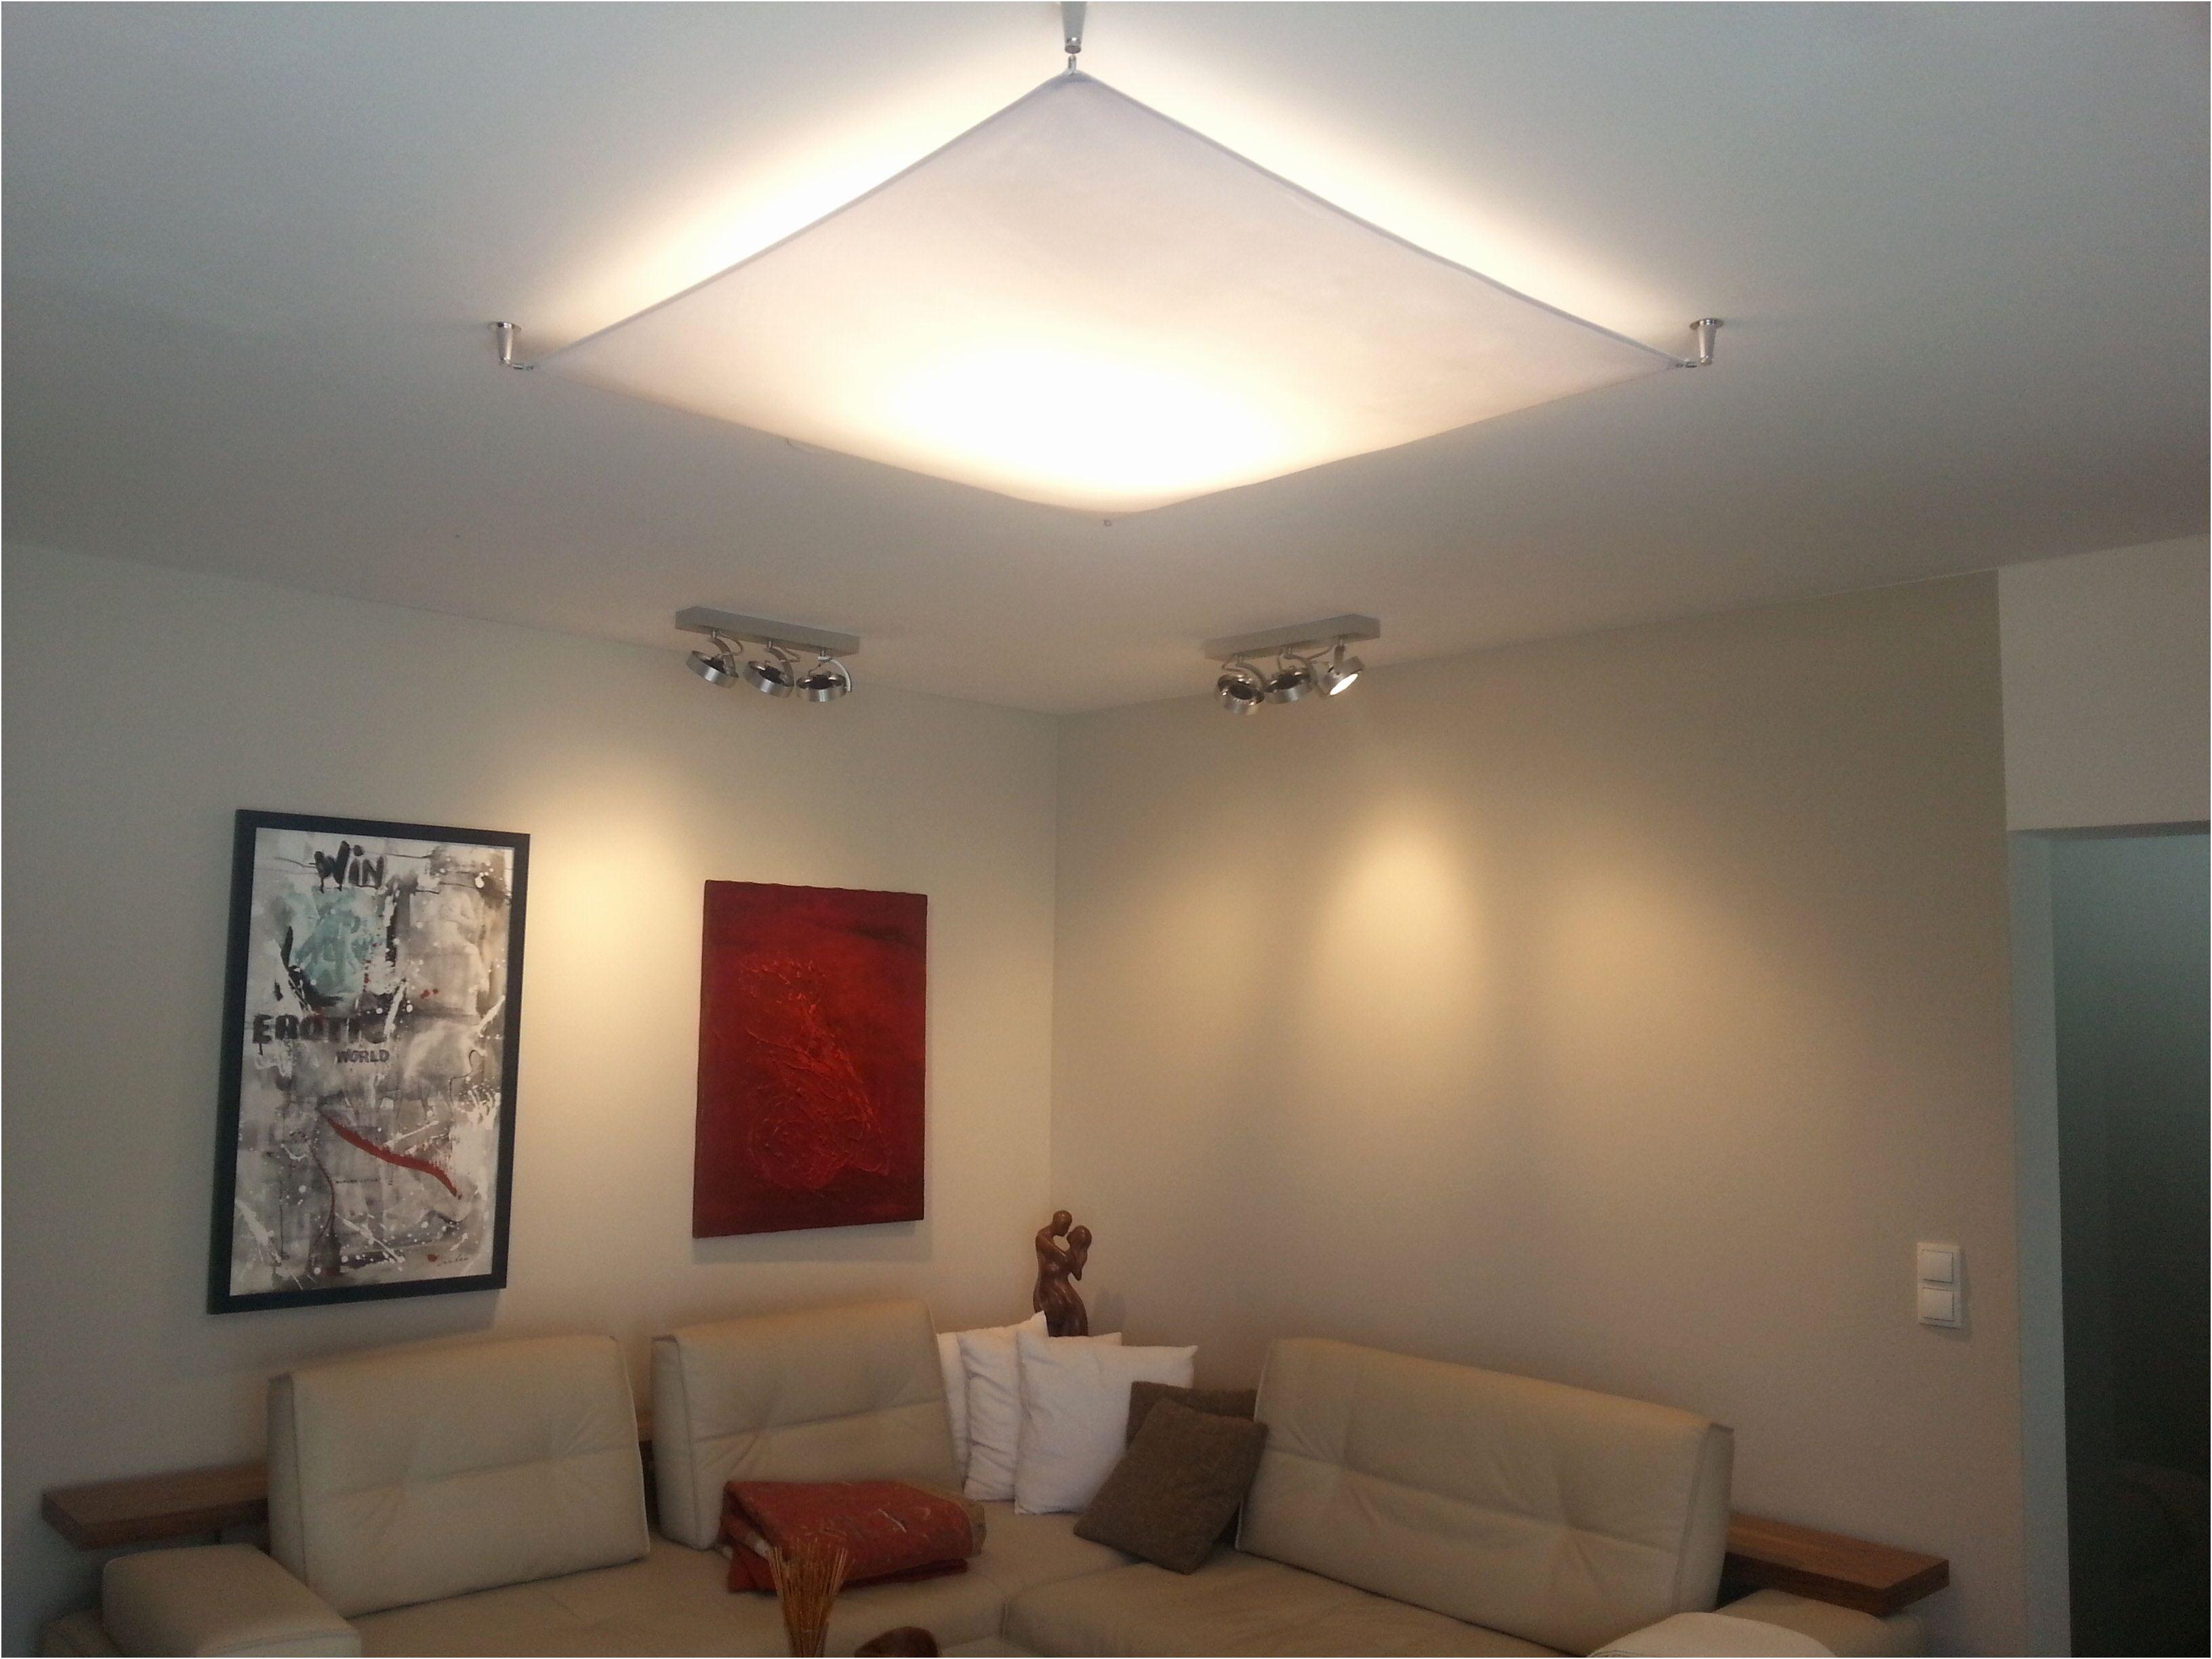 Wohndesign Wunderschon Lampe Decke Ideen From Lampe Flur Decke